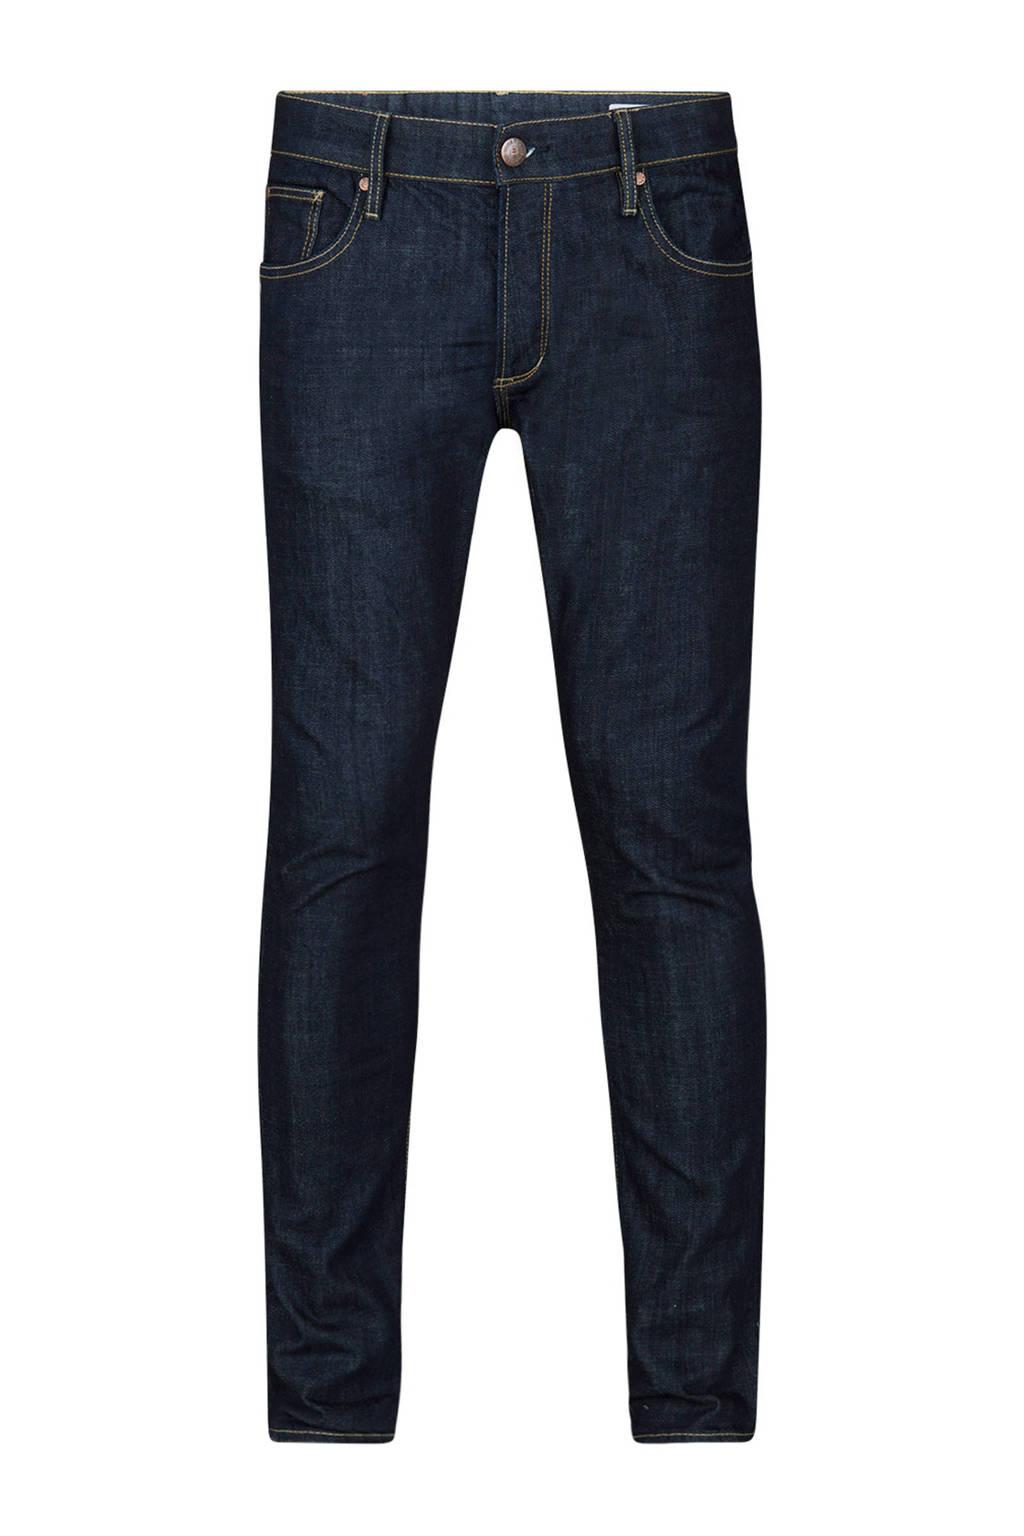 WE Fashion Blue Ridge slim fit jeans donkerblauw, Dark denim